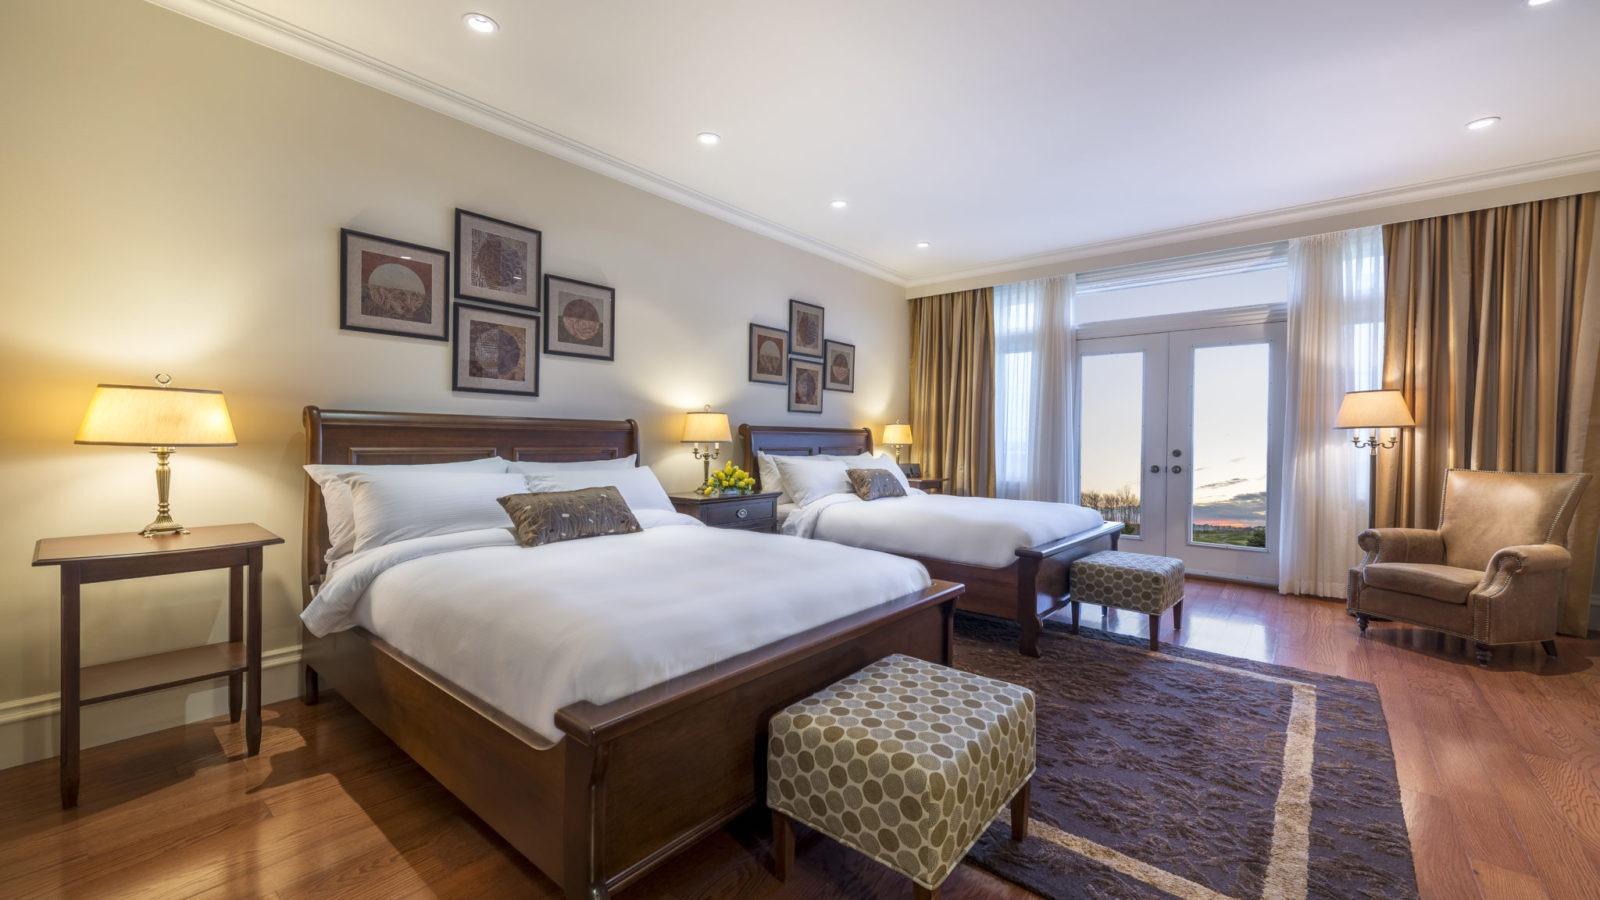 fox-harbr-resort-accommodation-studio-suite-large_27275787719_o